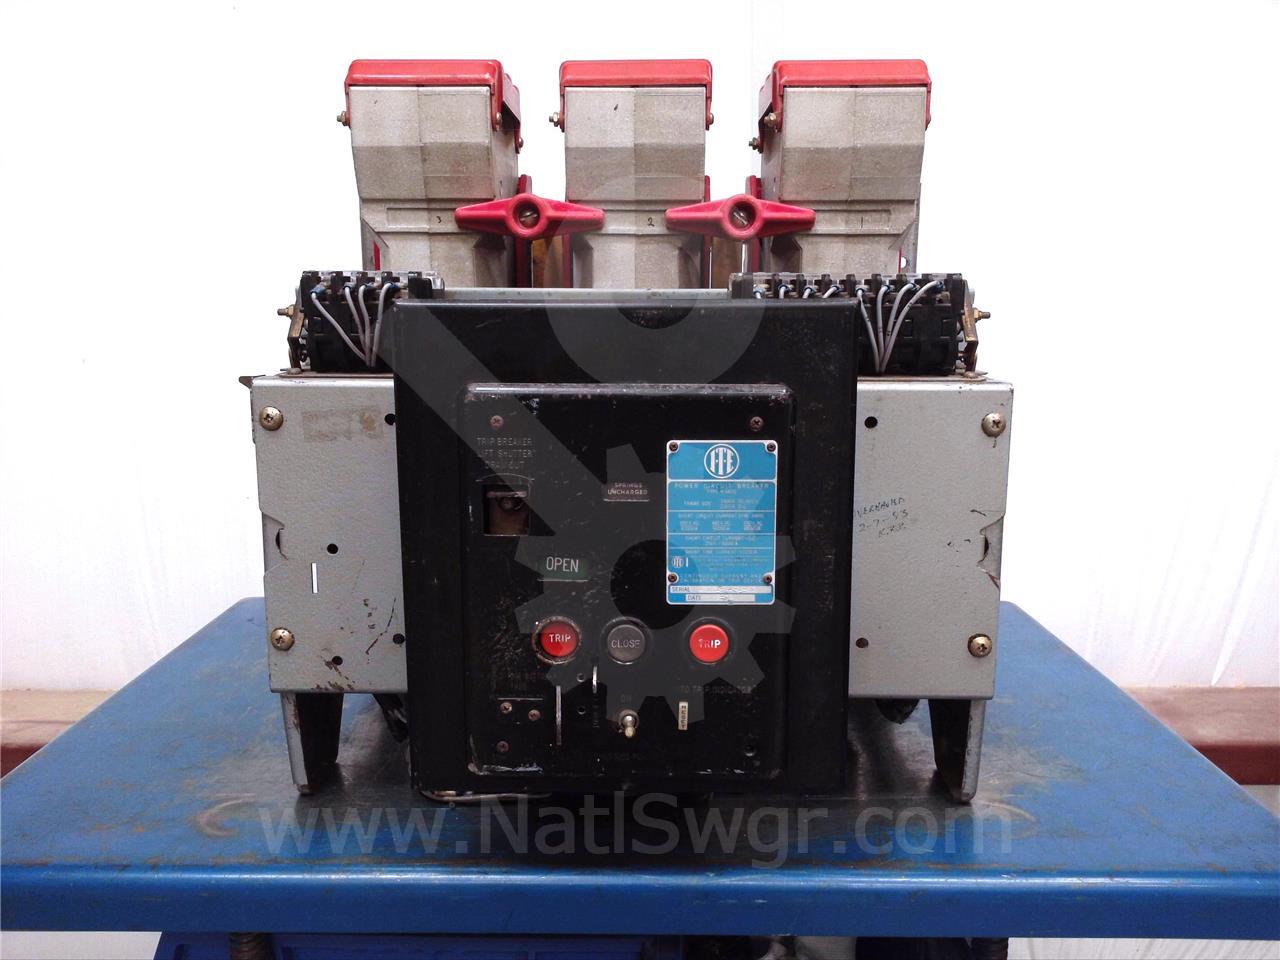 K-1600 1600A ITE RED EO/DO 125VDC CONTROL, OD-4 600A LS